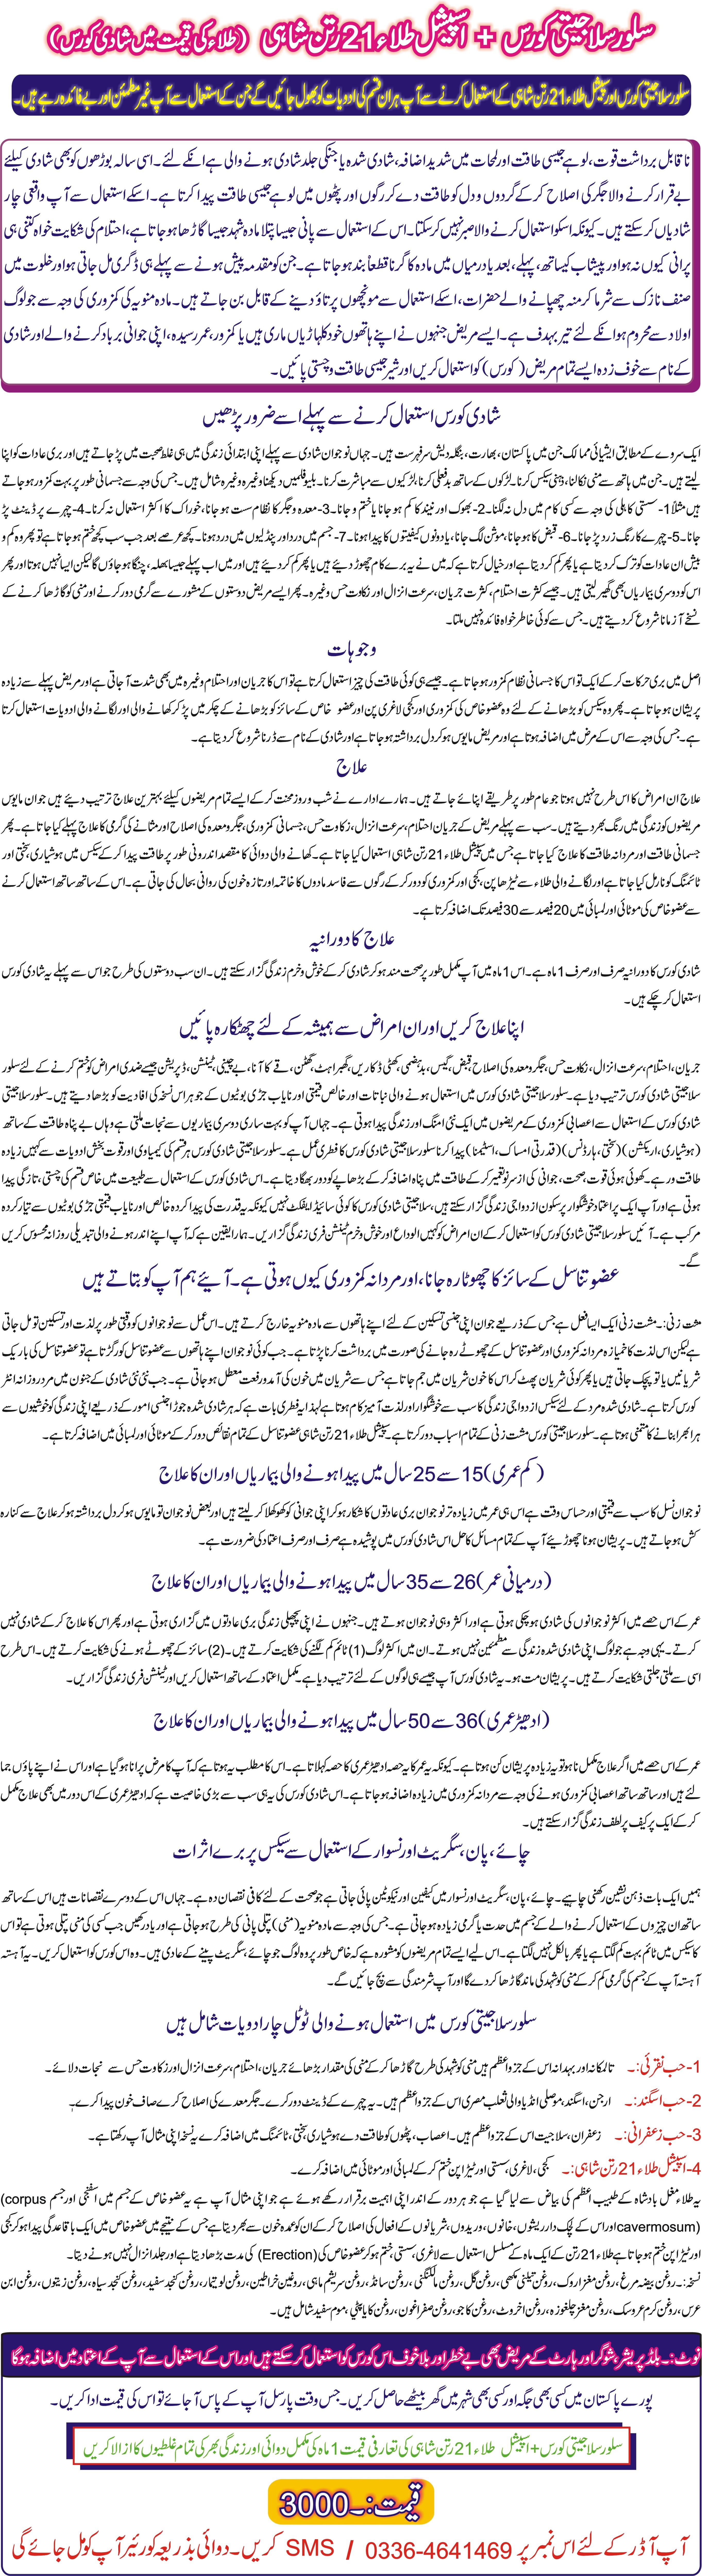 silver_shilajiti _course_ in_ urdu